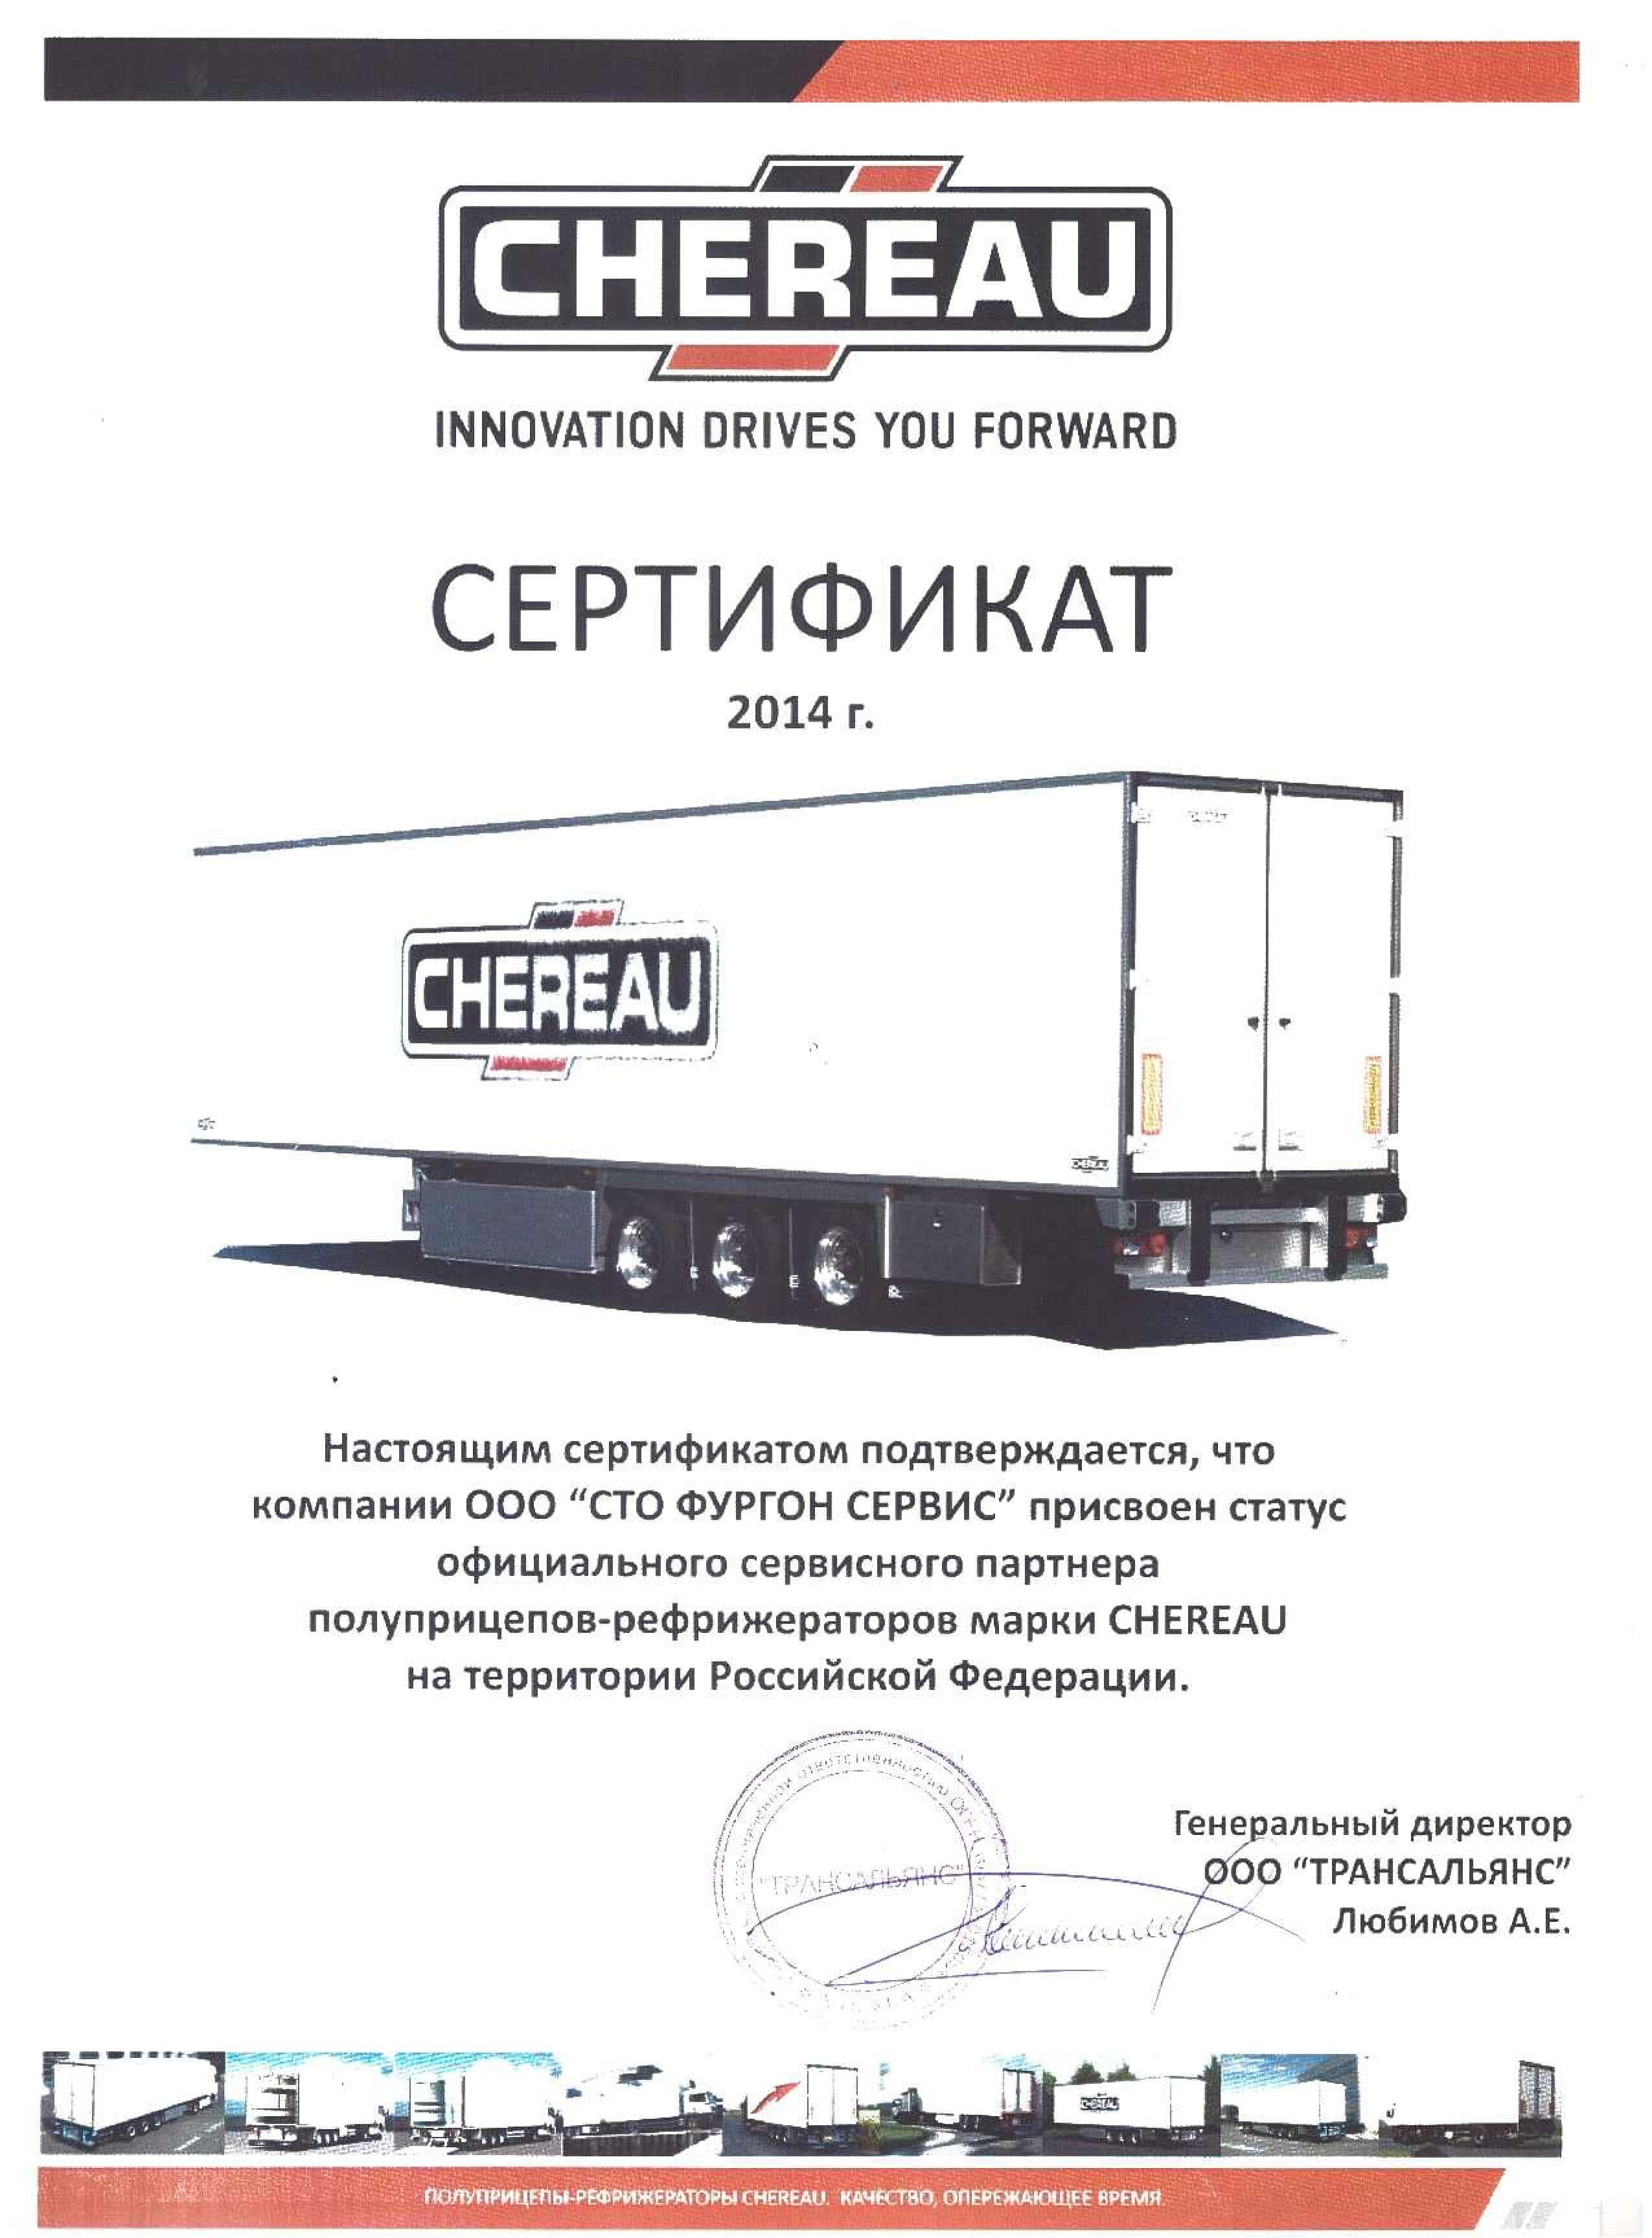 oficialnie_partneri_obslyjivanie_i_remont_refrejiratorov_chereau